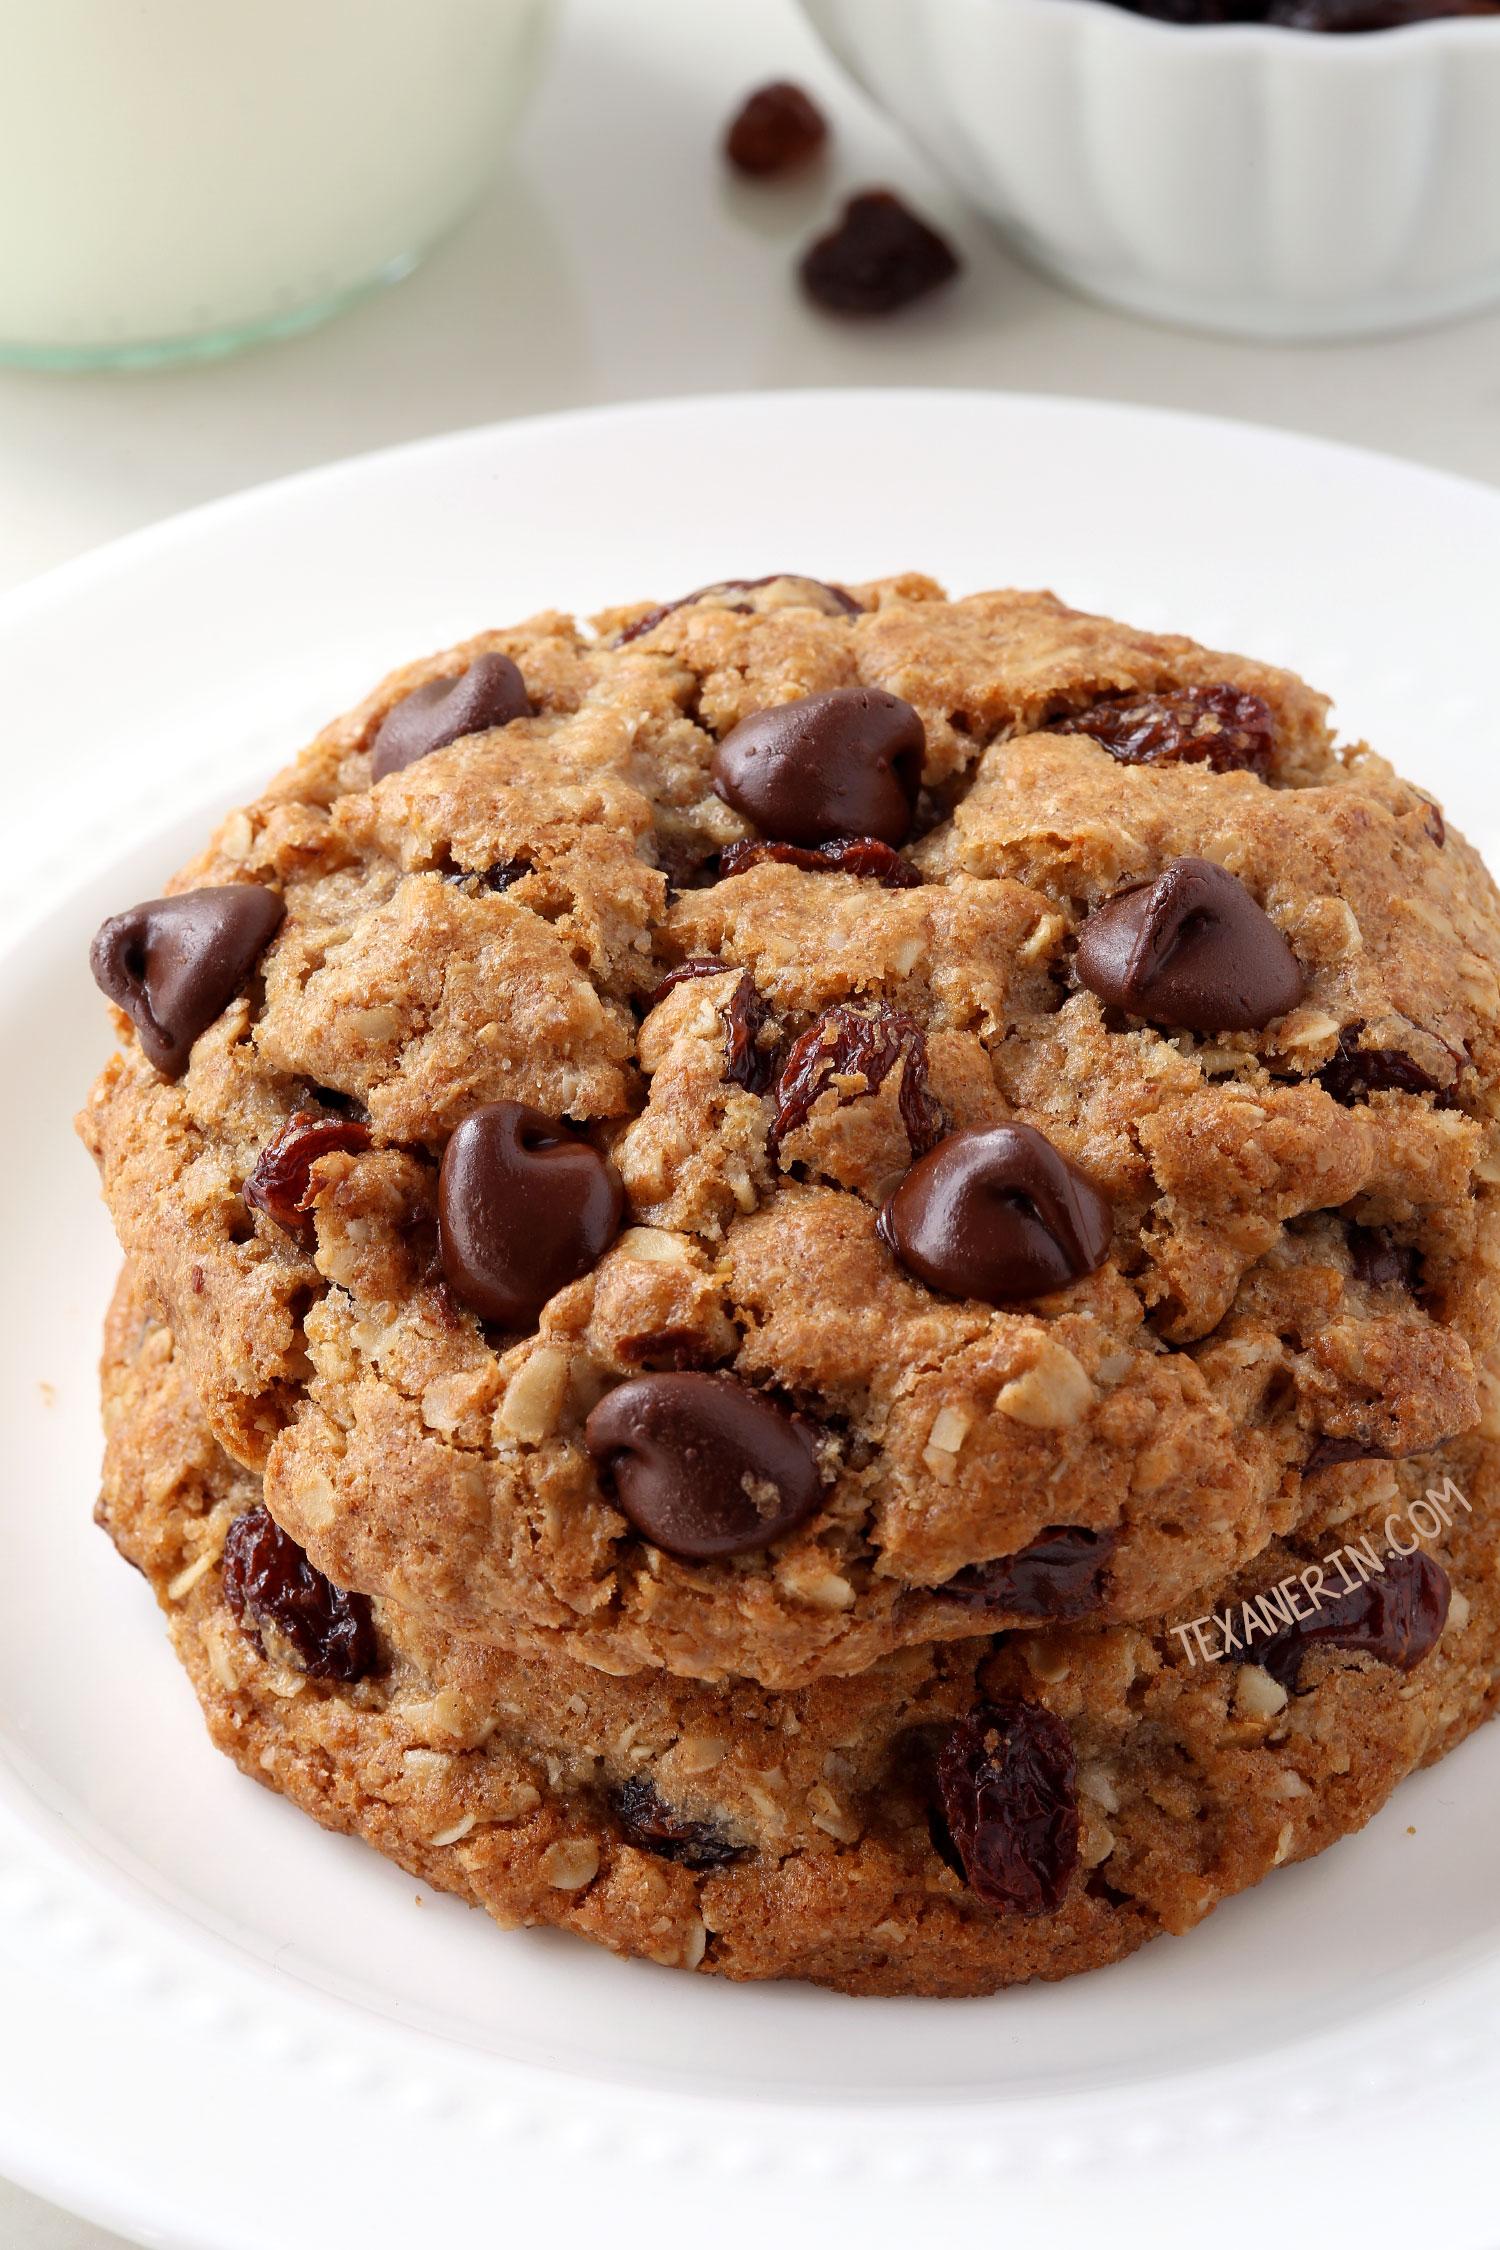 whole-wheat-oatmeal-raisin-cookies-1.jpg